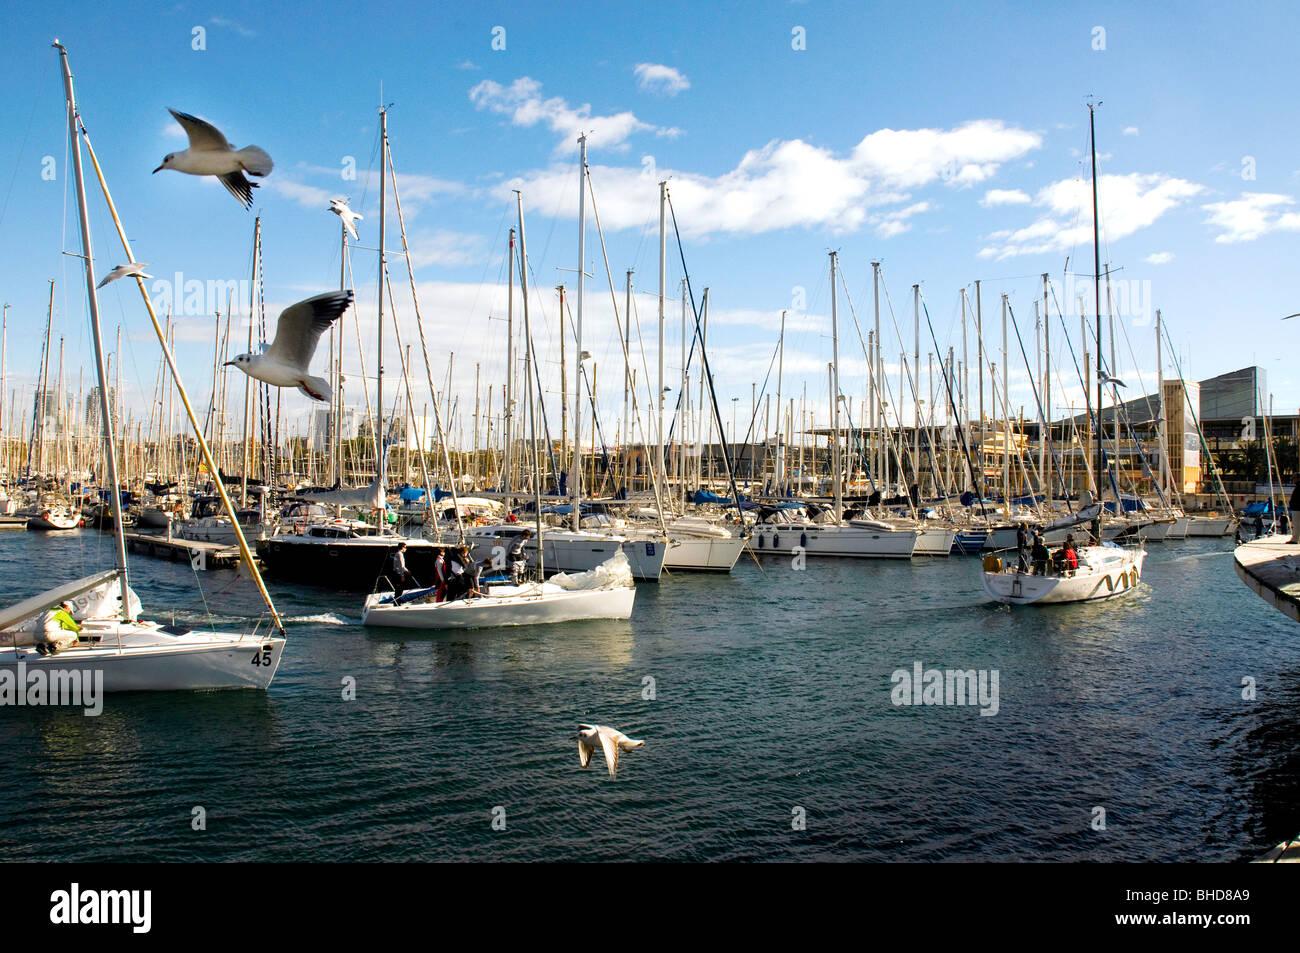 Boats in Port Vell, Barcelona, Spain - Stock Image